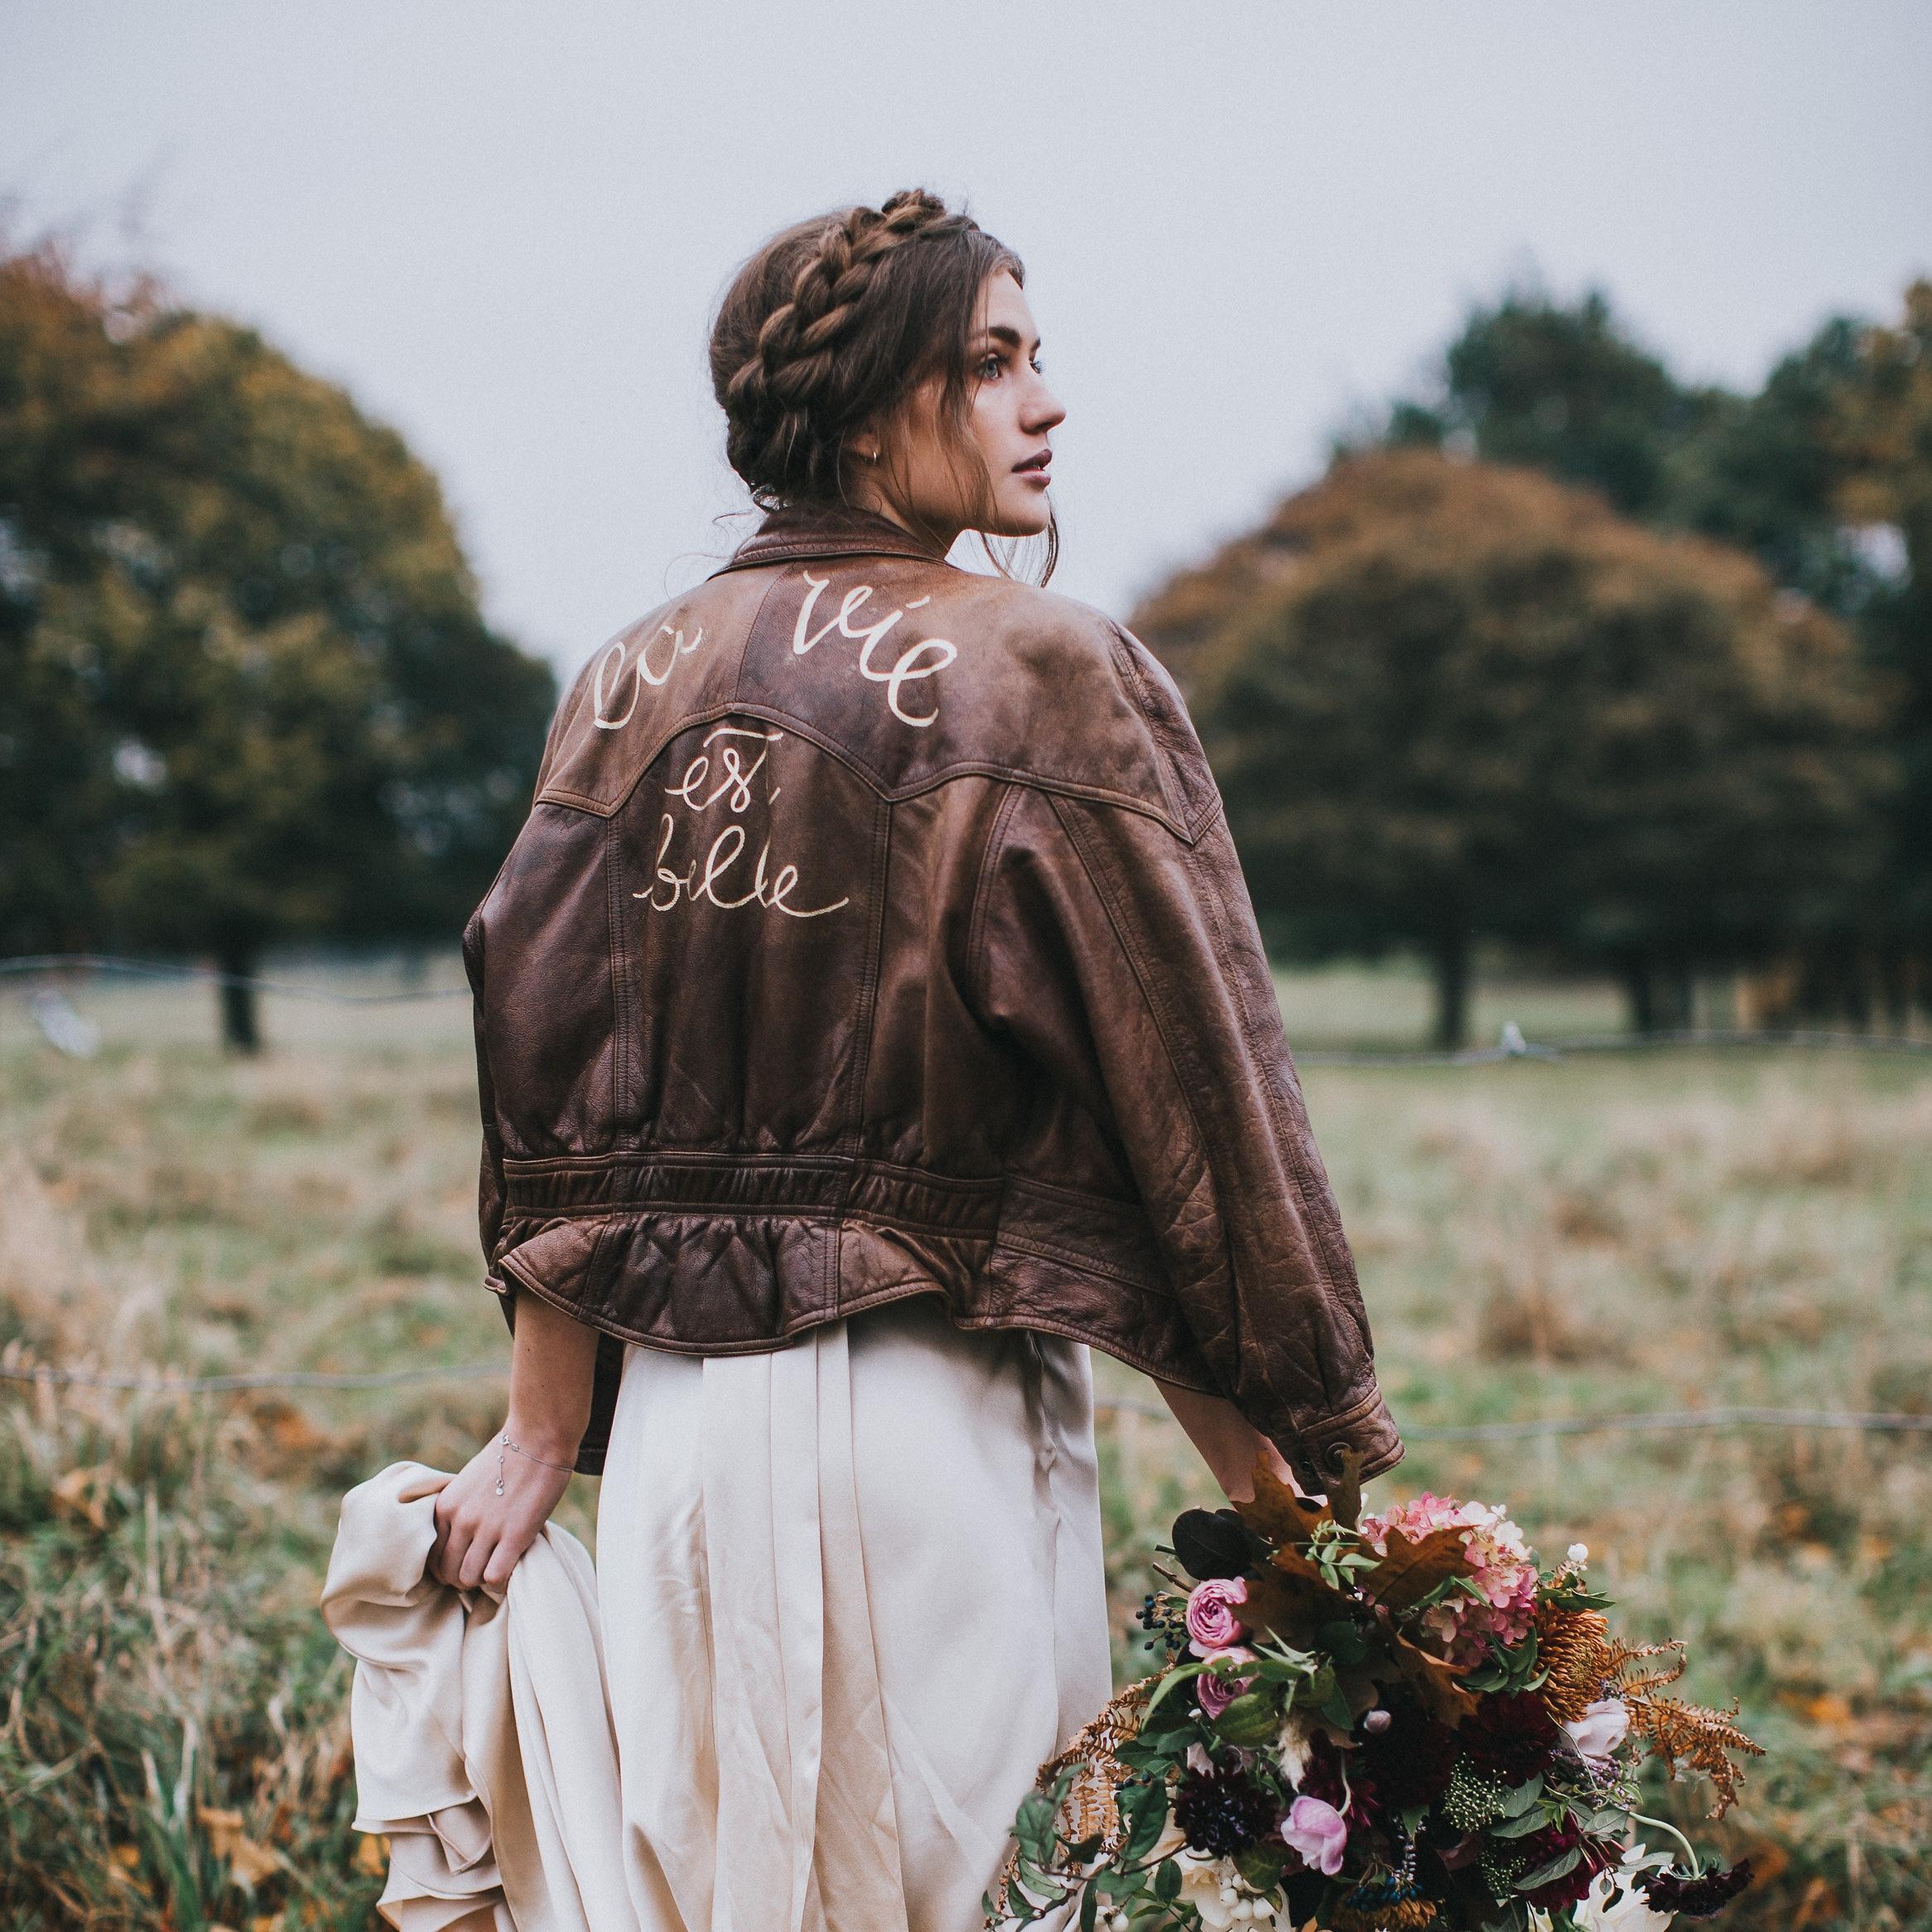 Kayleigh Tarrant | Image: Matt Horan